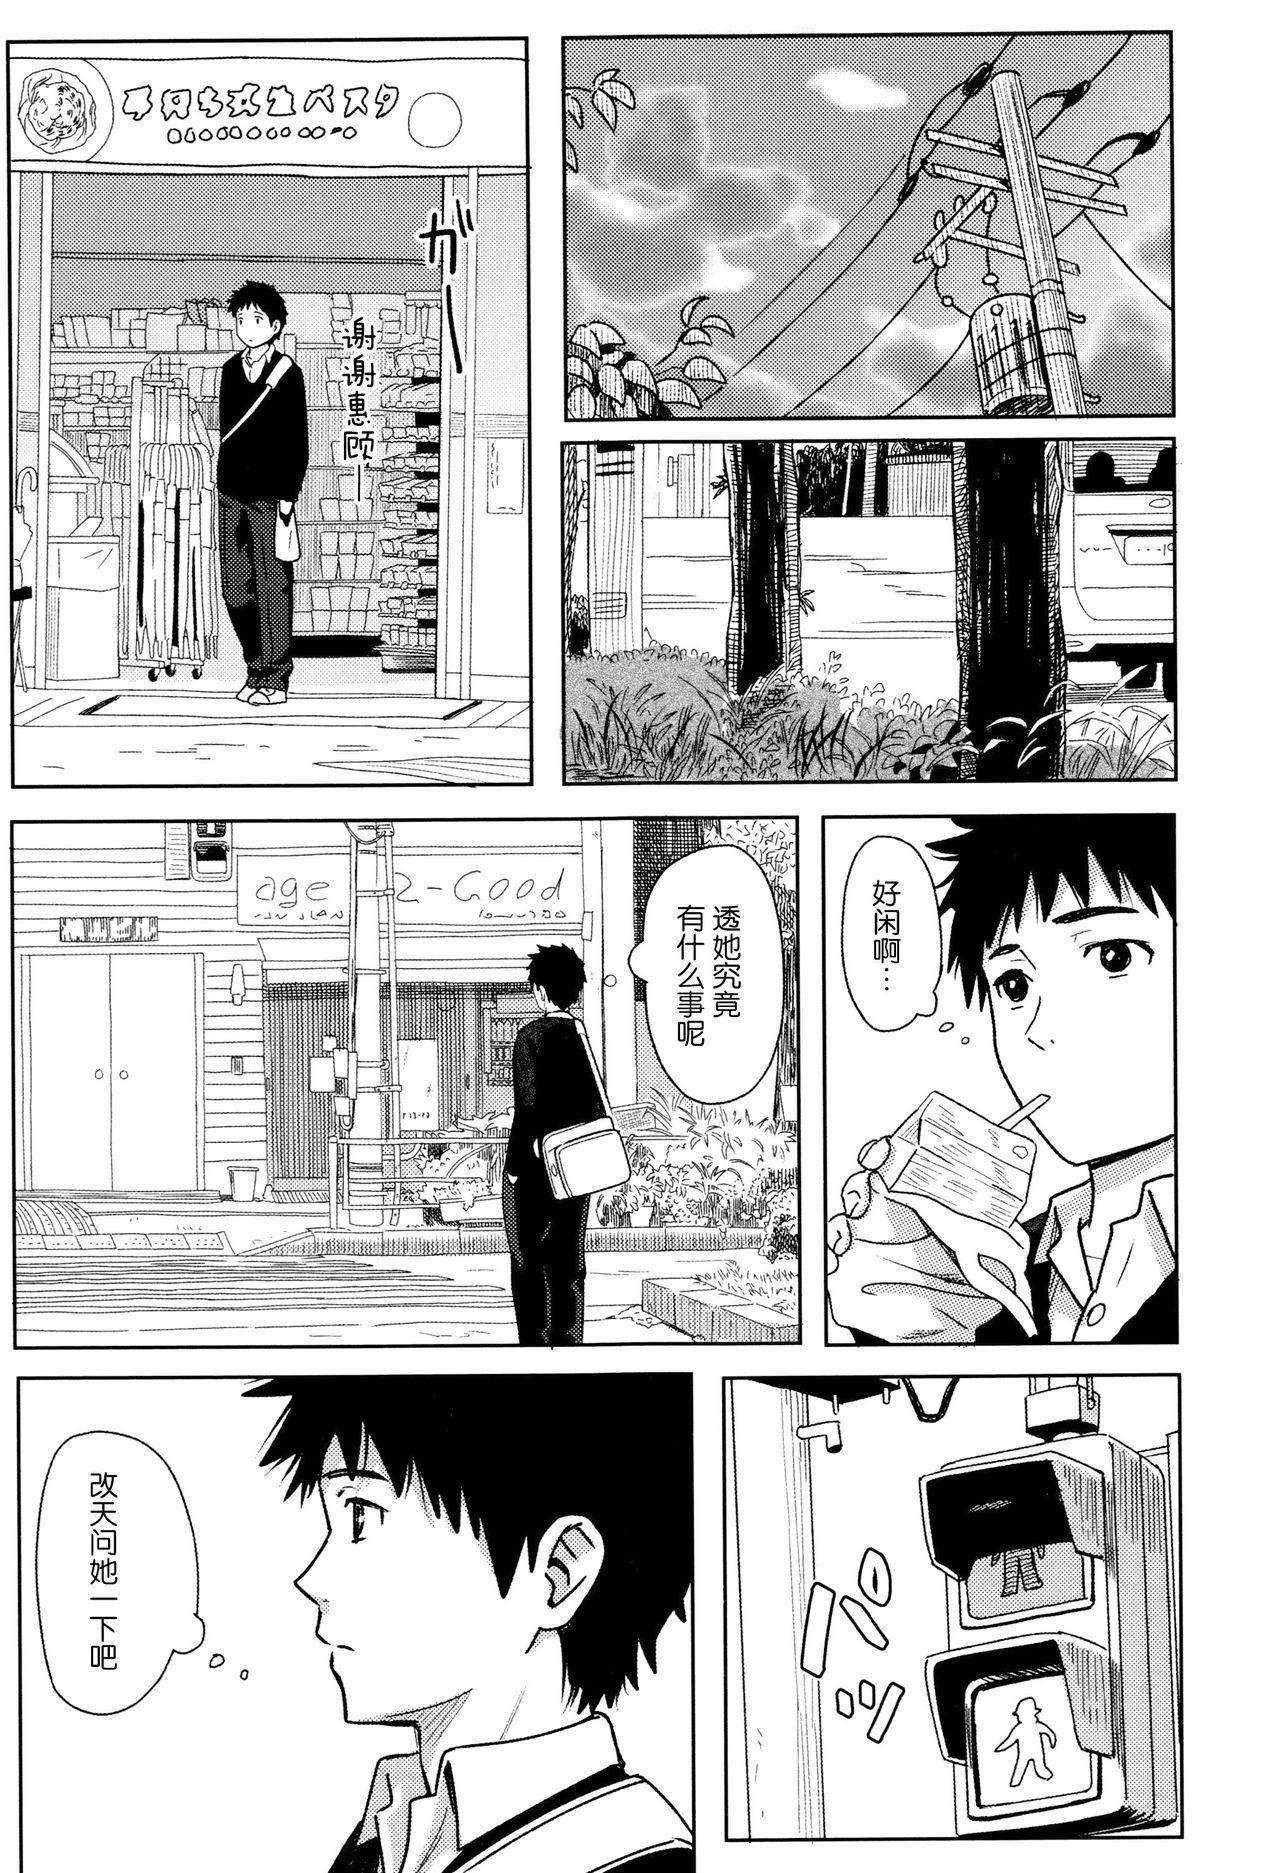 Tokubetsu na Mainichi - Special daily 7